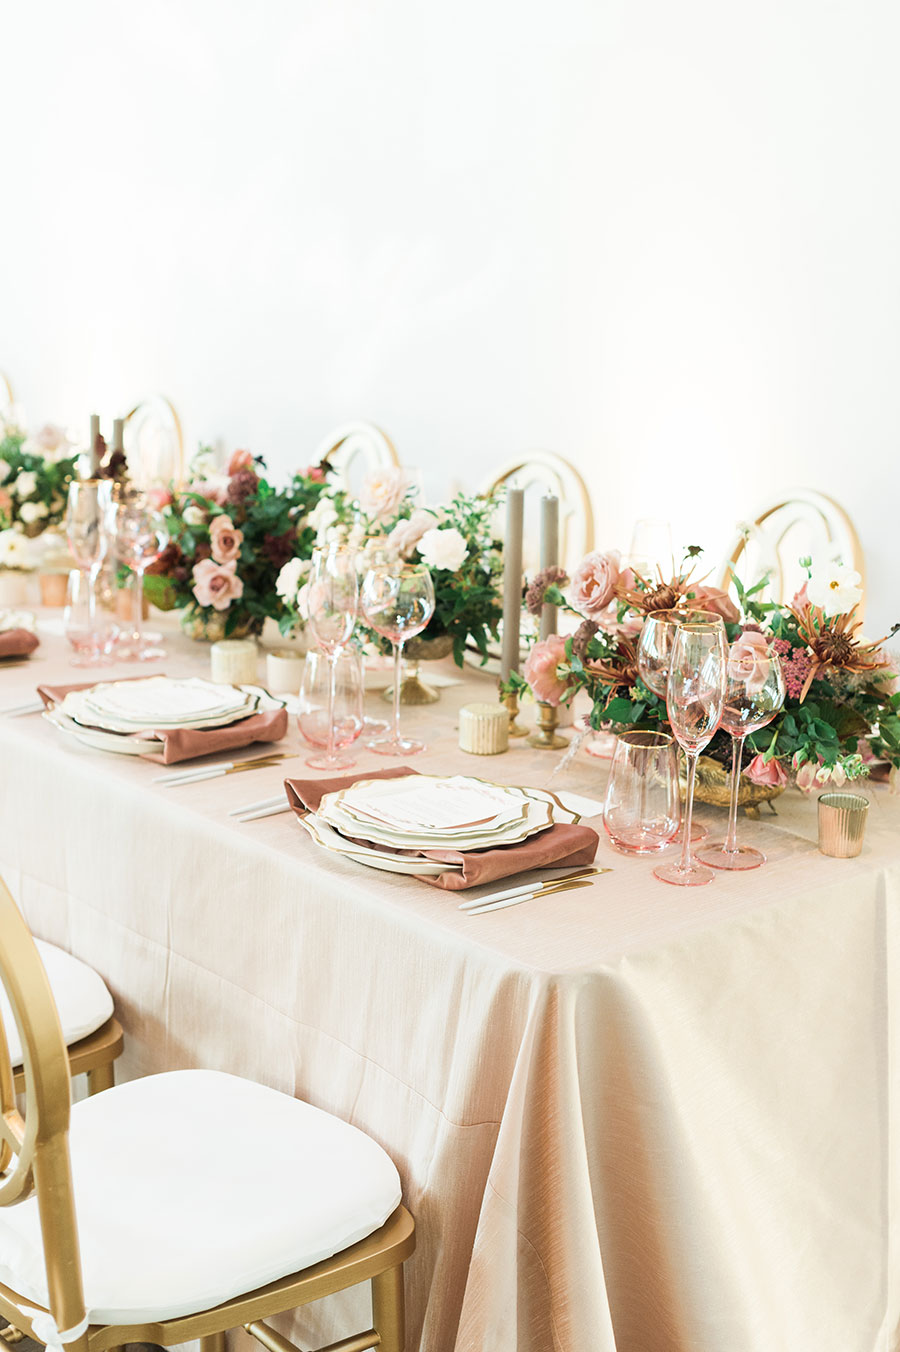 lvl-academy-wedding-planner-workshop-15.jpg